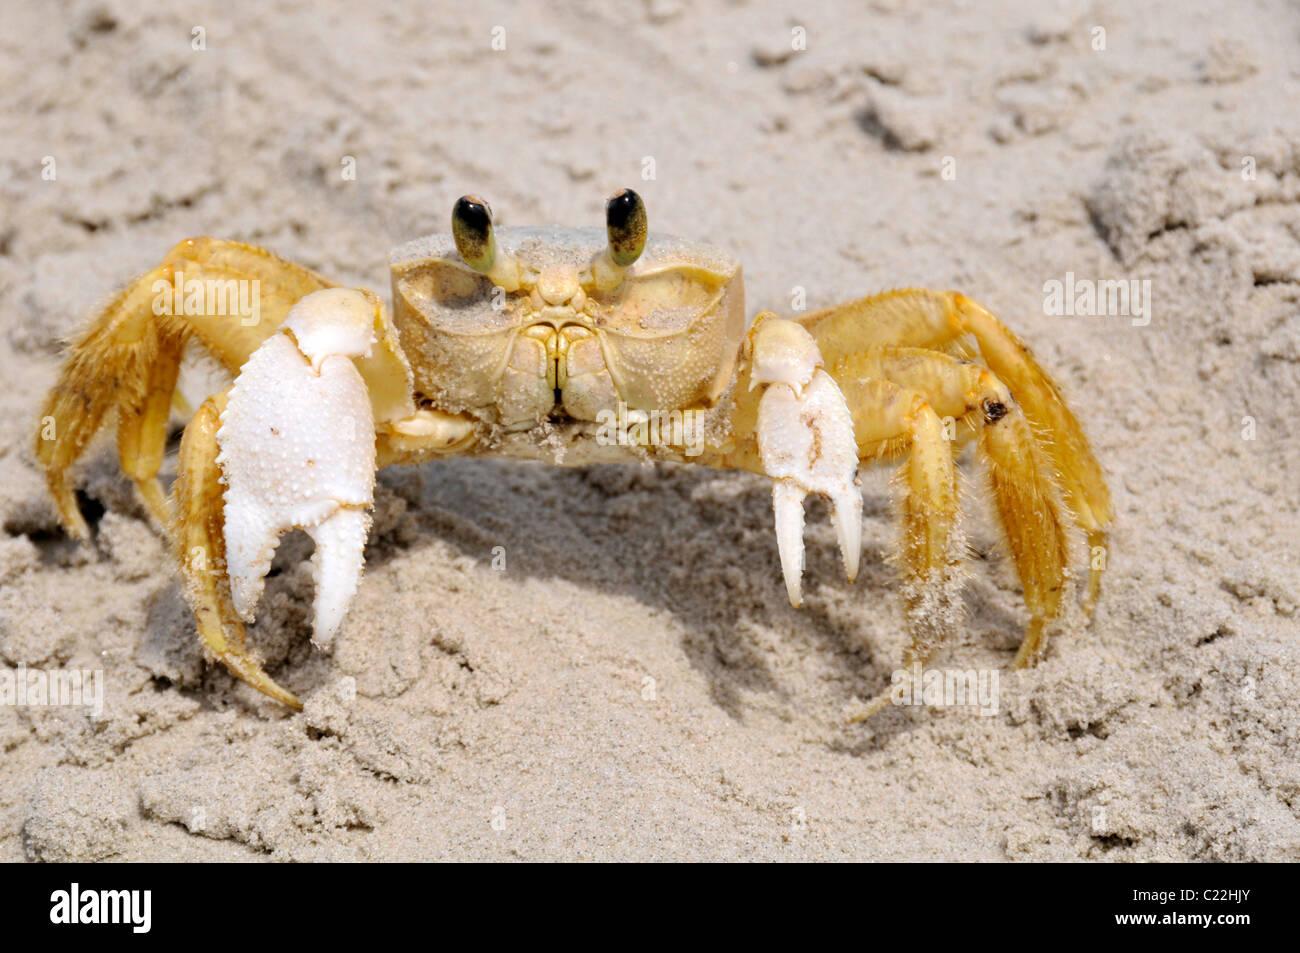 Ghost crab, Ocypode quadrata, Mel Island, Paranagua, Parana, Brazil, South Atlantic - Stock Image